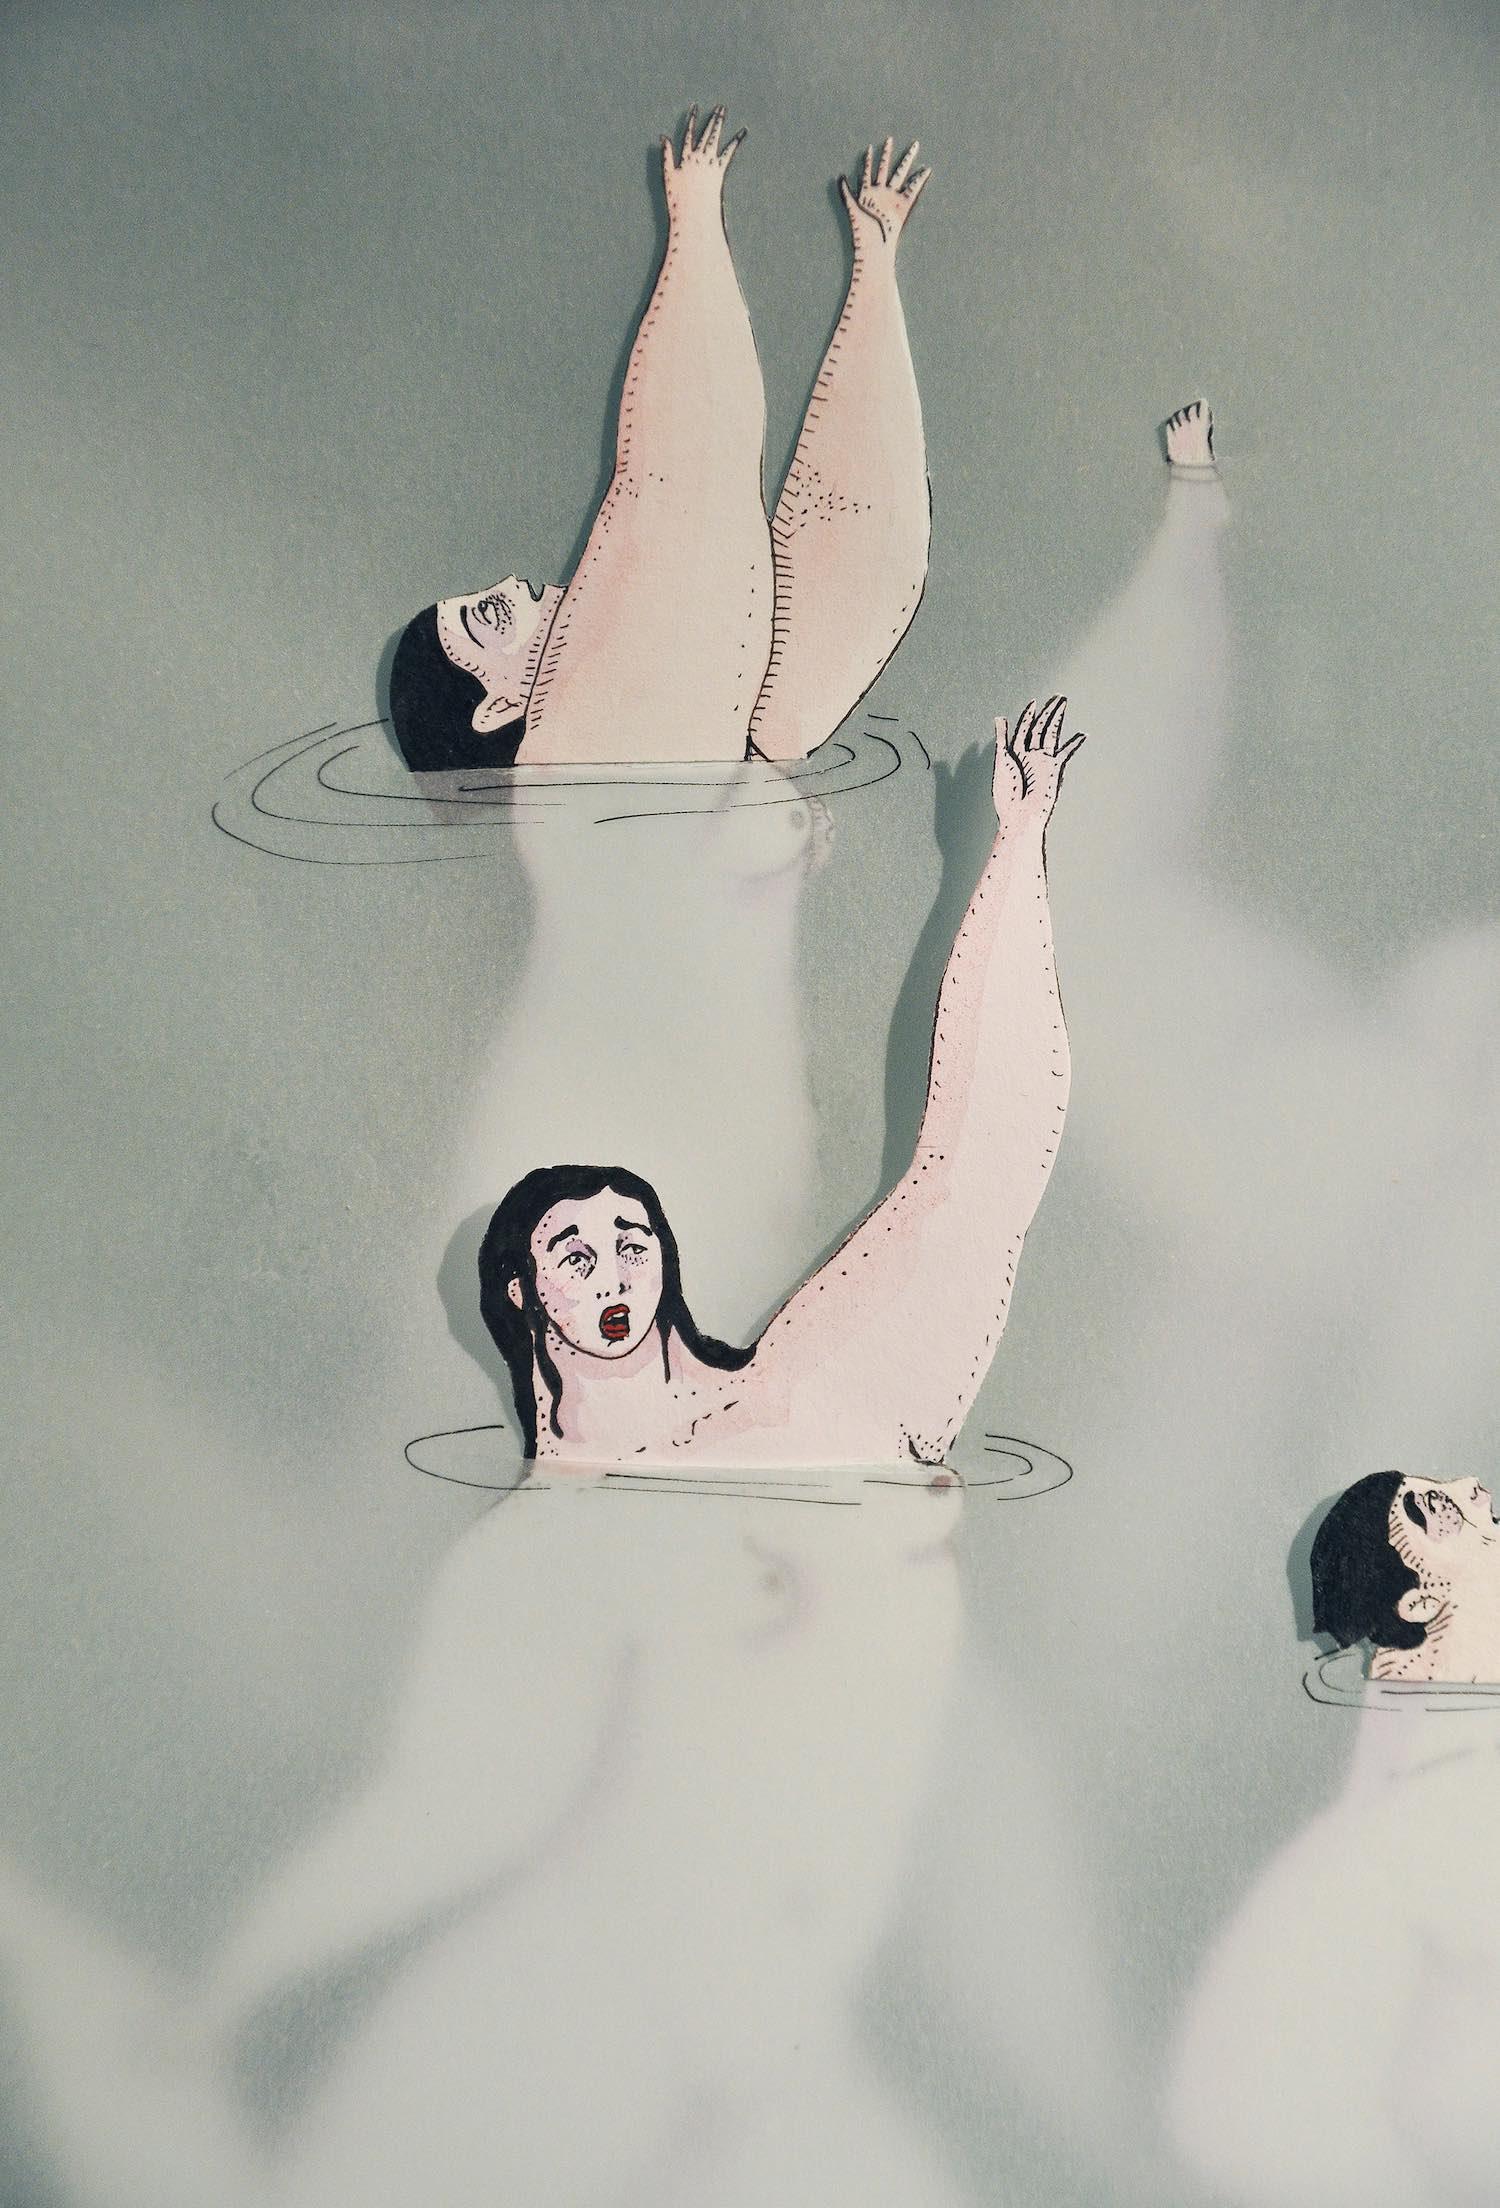 art_soniaalinsmiguel_donesdaigua_waterwomenii_06